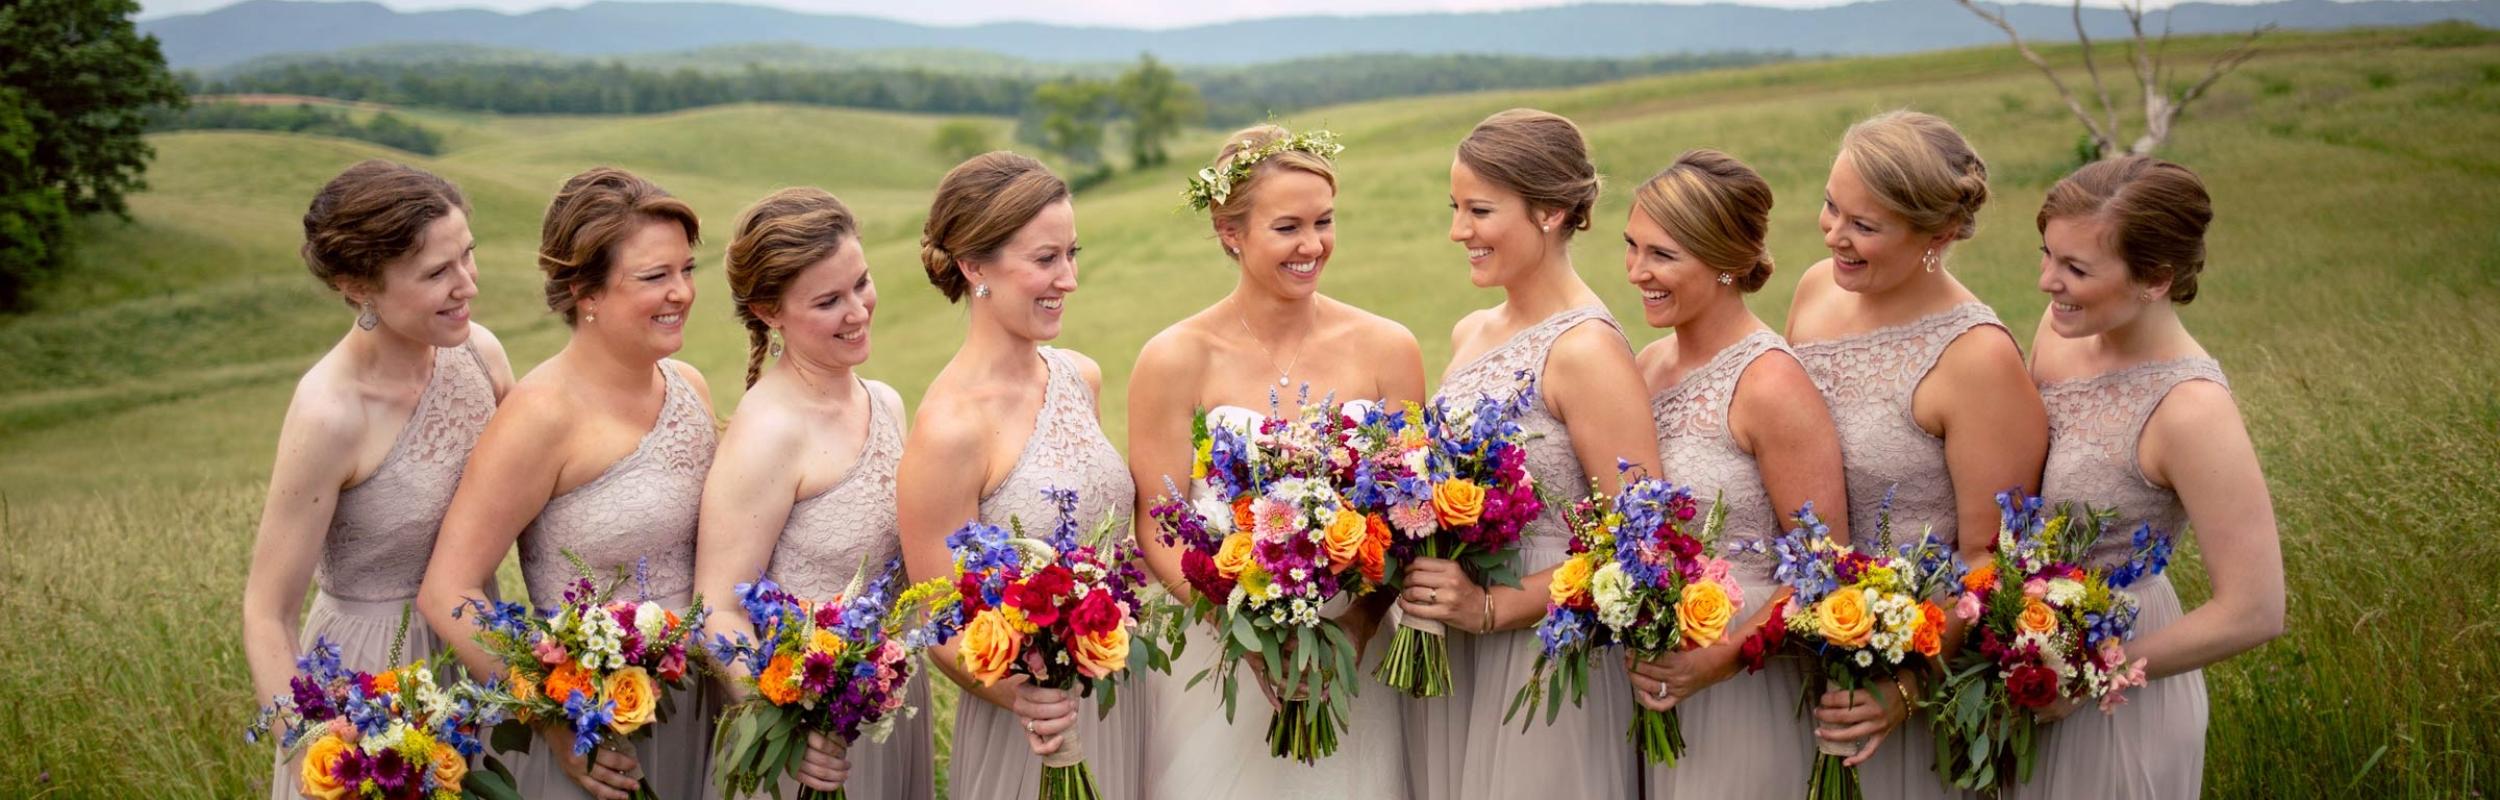 flower-vintage-bright-bridesmaids